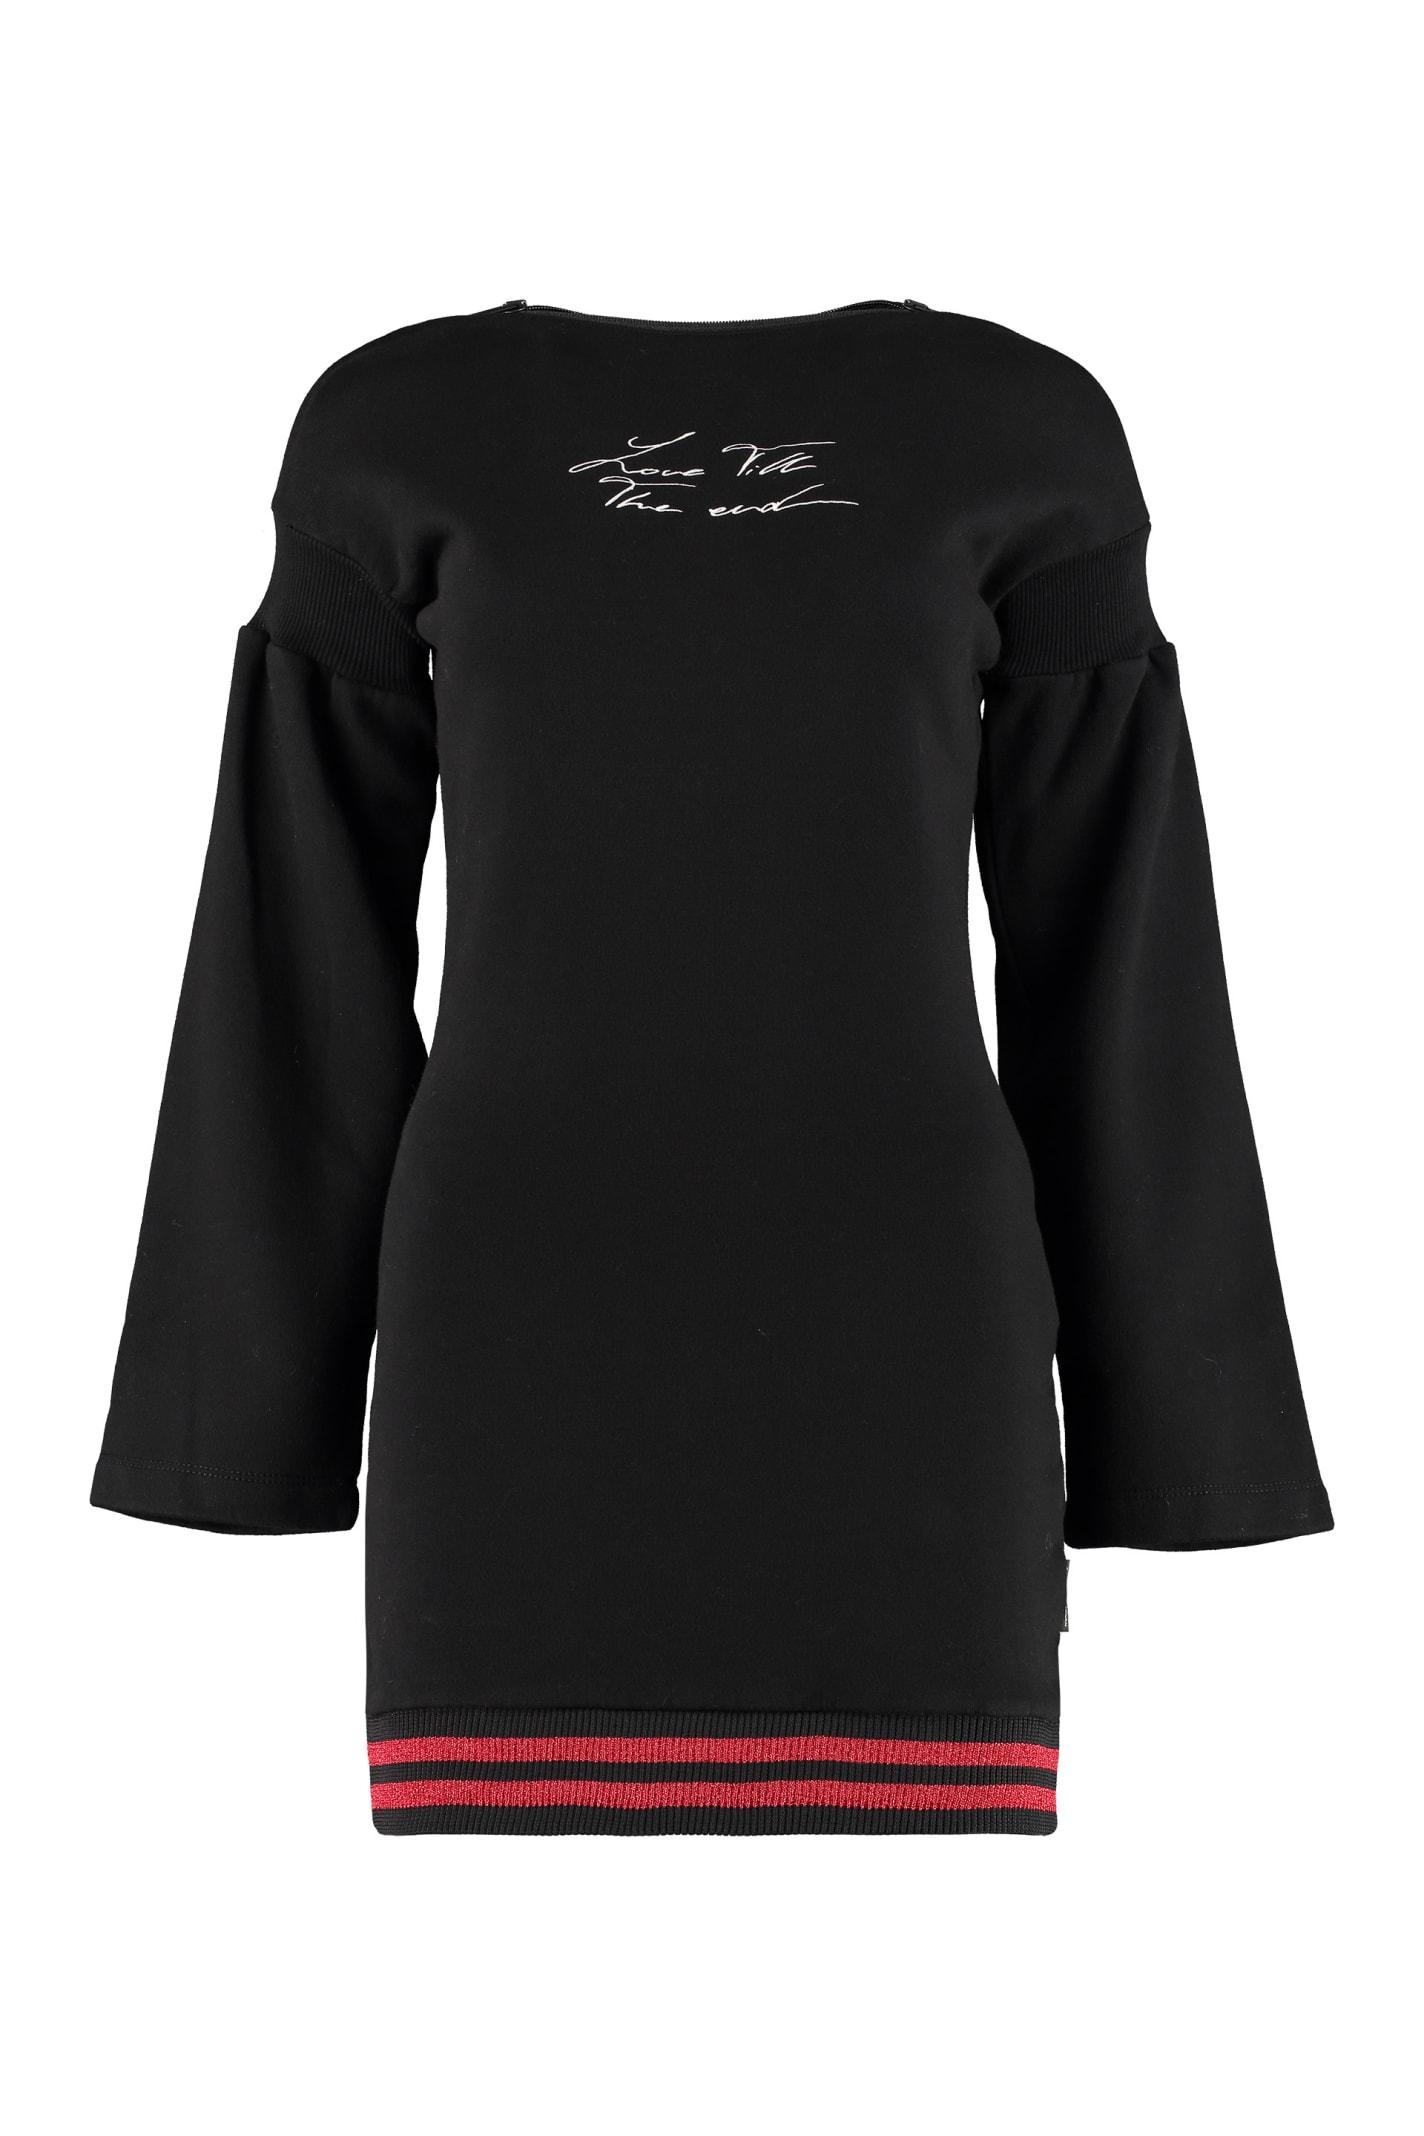 Buy Marcelo Burlon Love T.t.e. Cotton Sweatdress online, shop Marcelo Burlon with free shipping